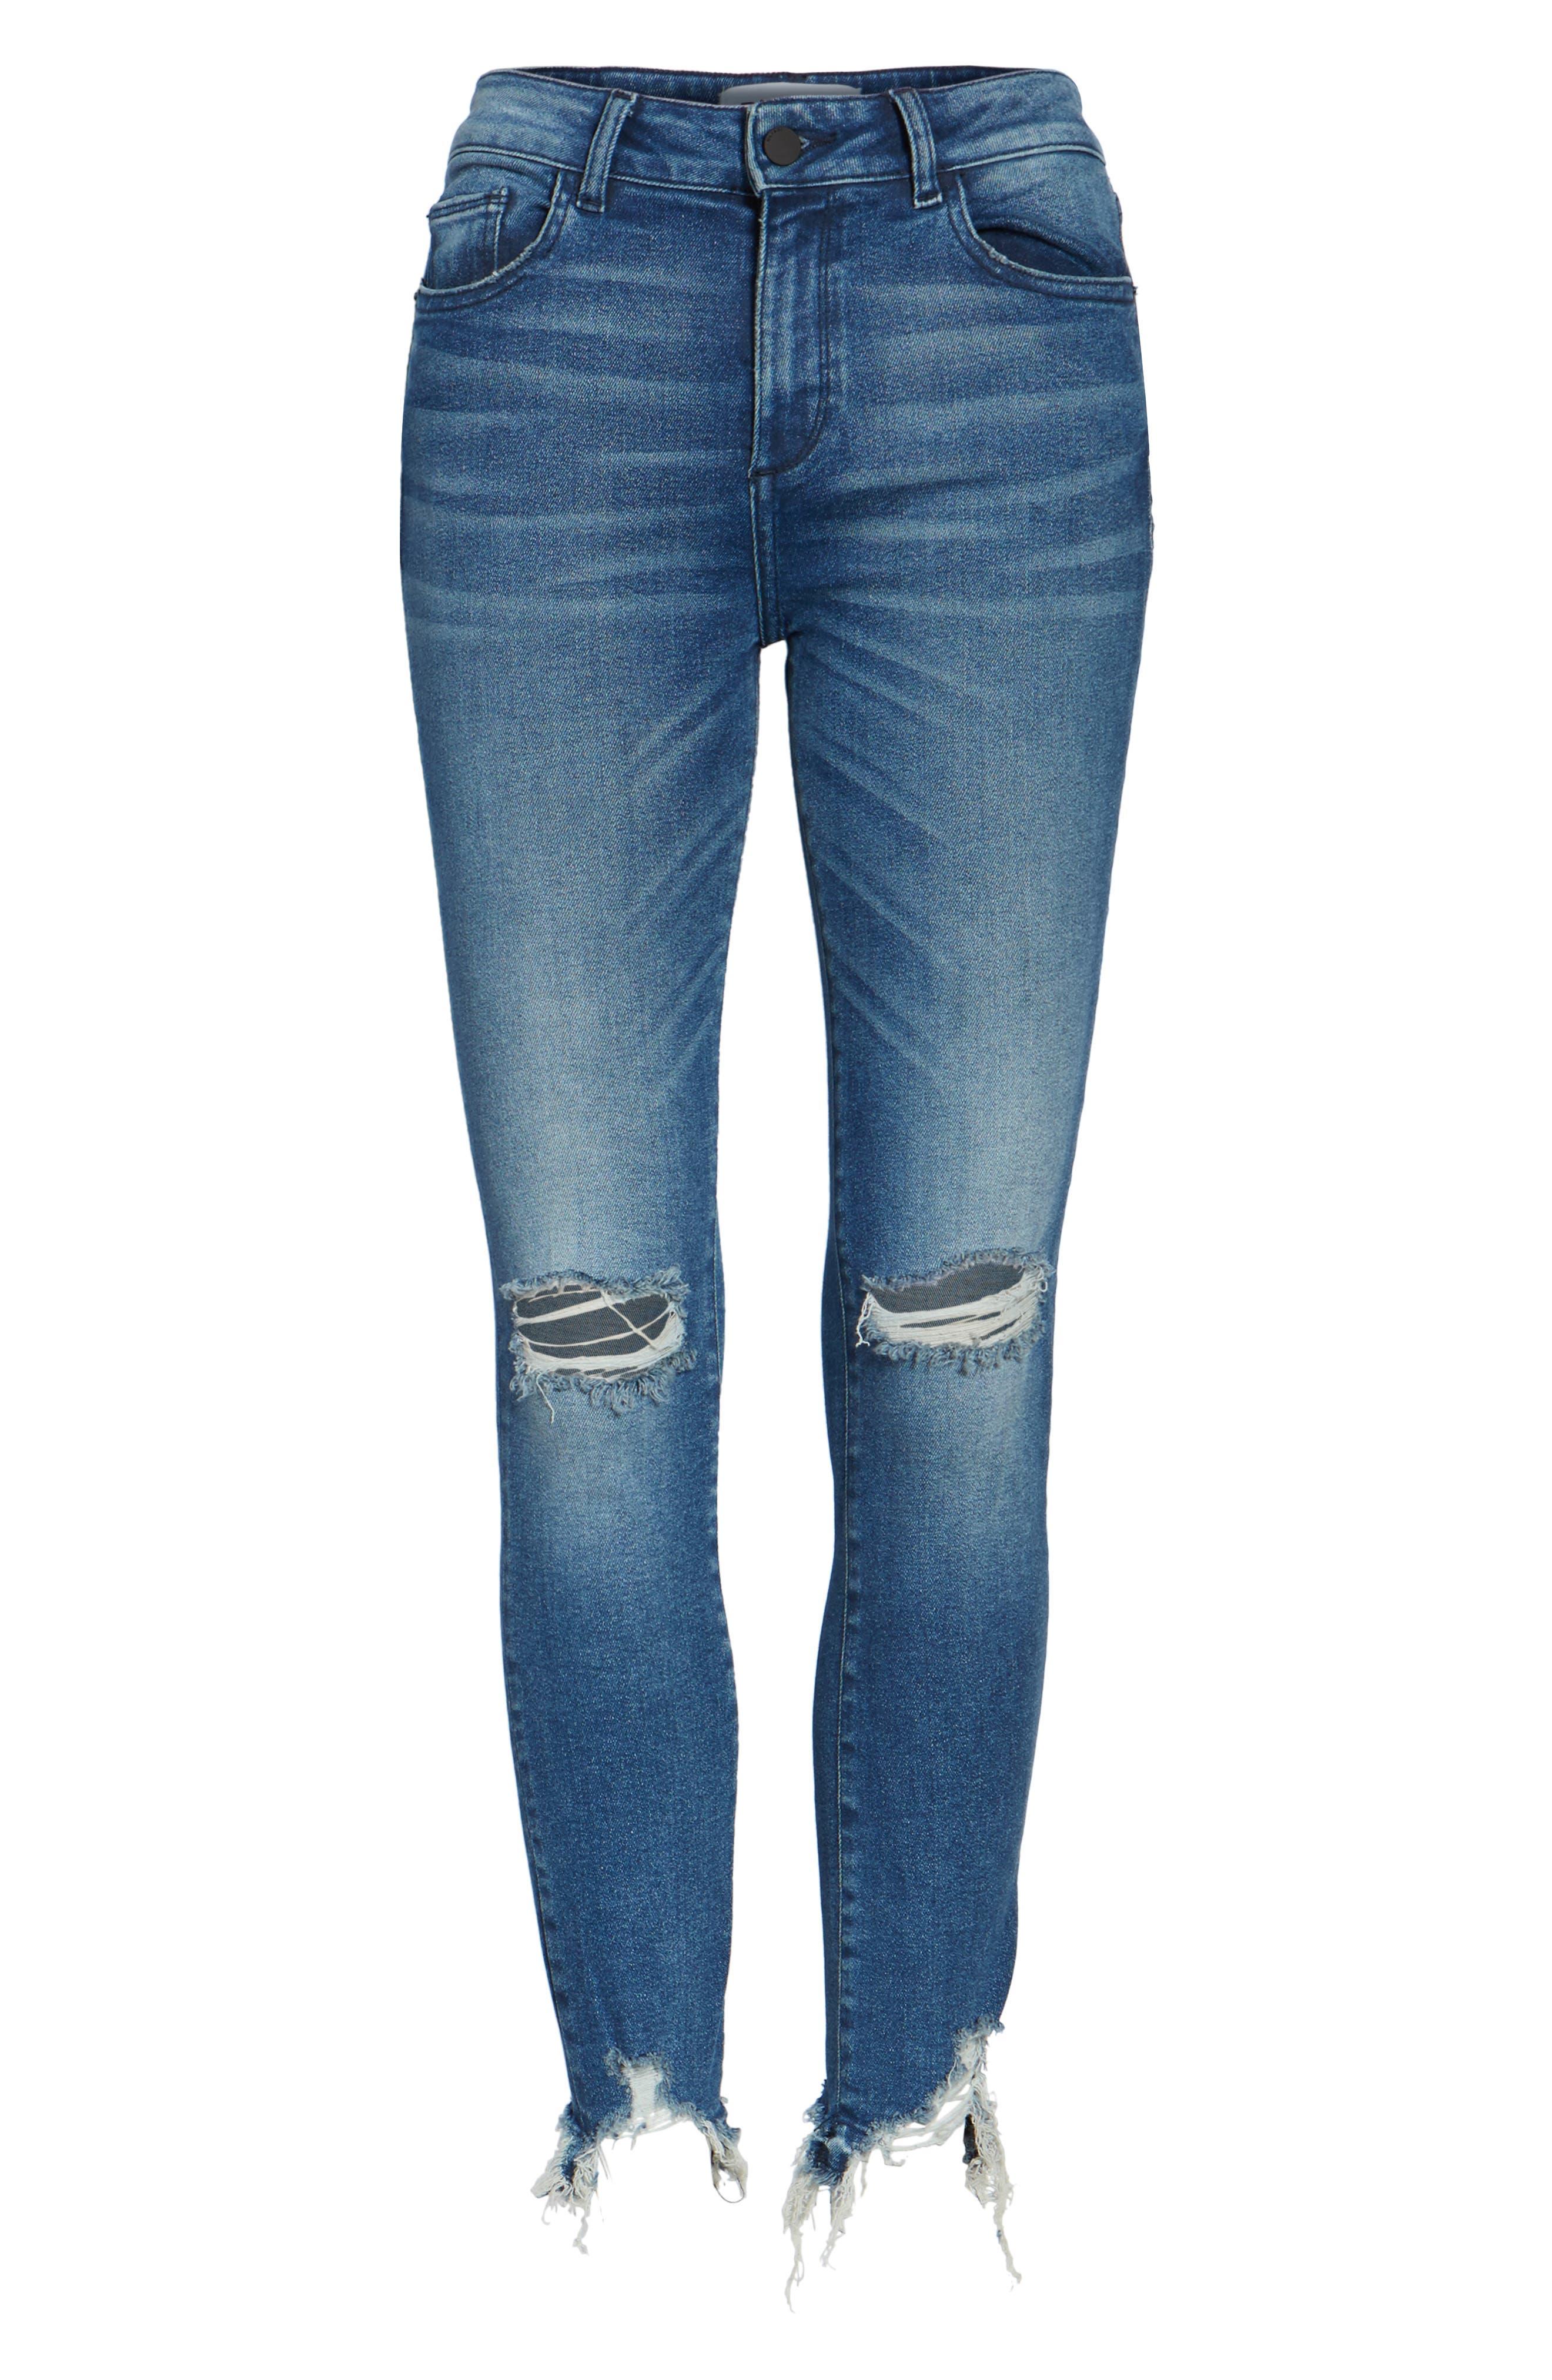 Farrow Instaslim High Waist Ankle Skinny Jeans,                             Alternate thumbnail 6, color,                             LARAMIE